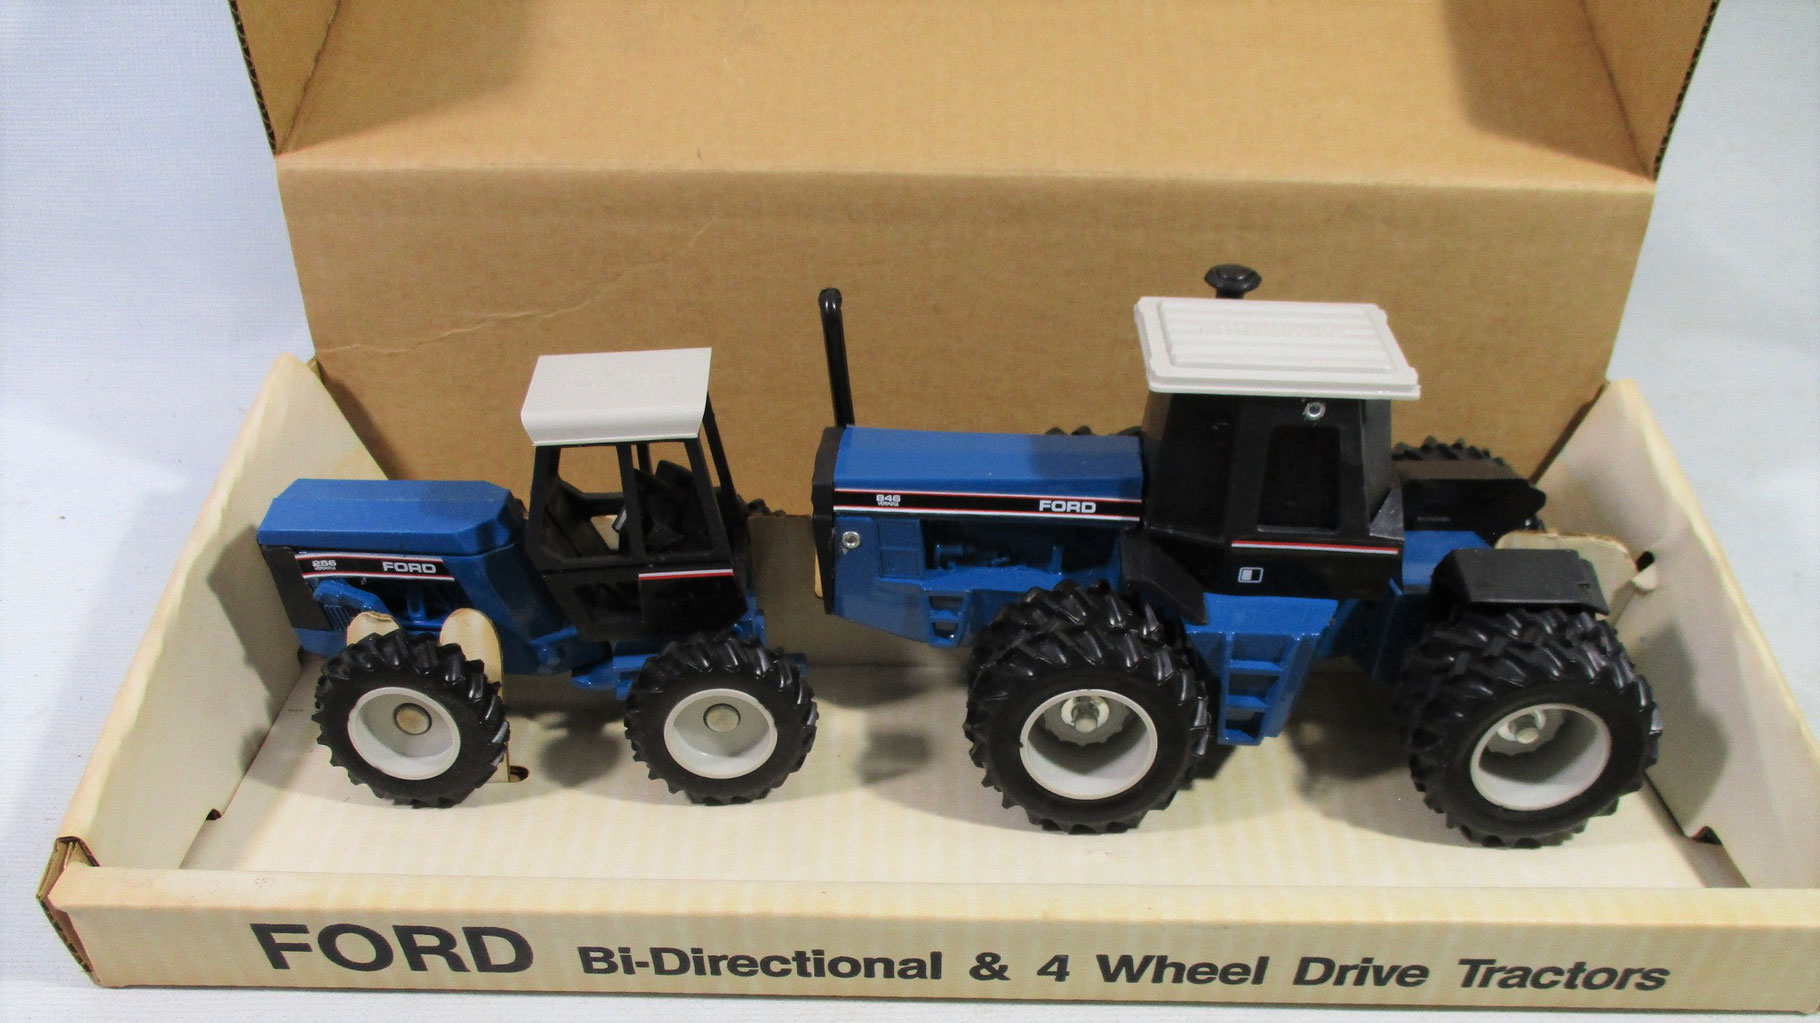 Ford Bi Directional Tractor : Fs farm toys arizona diecast models